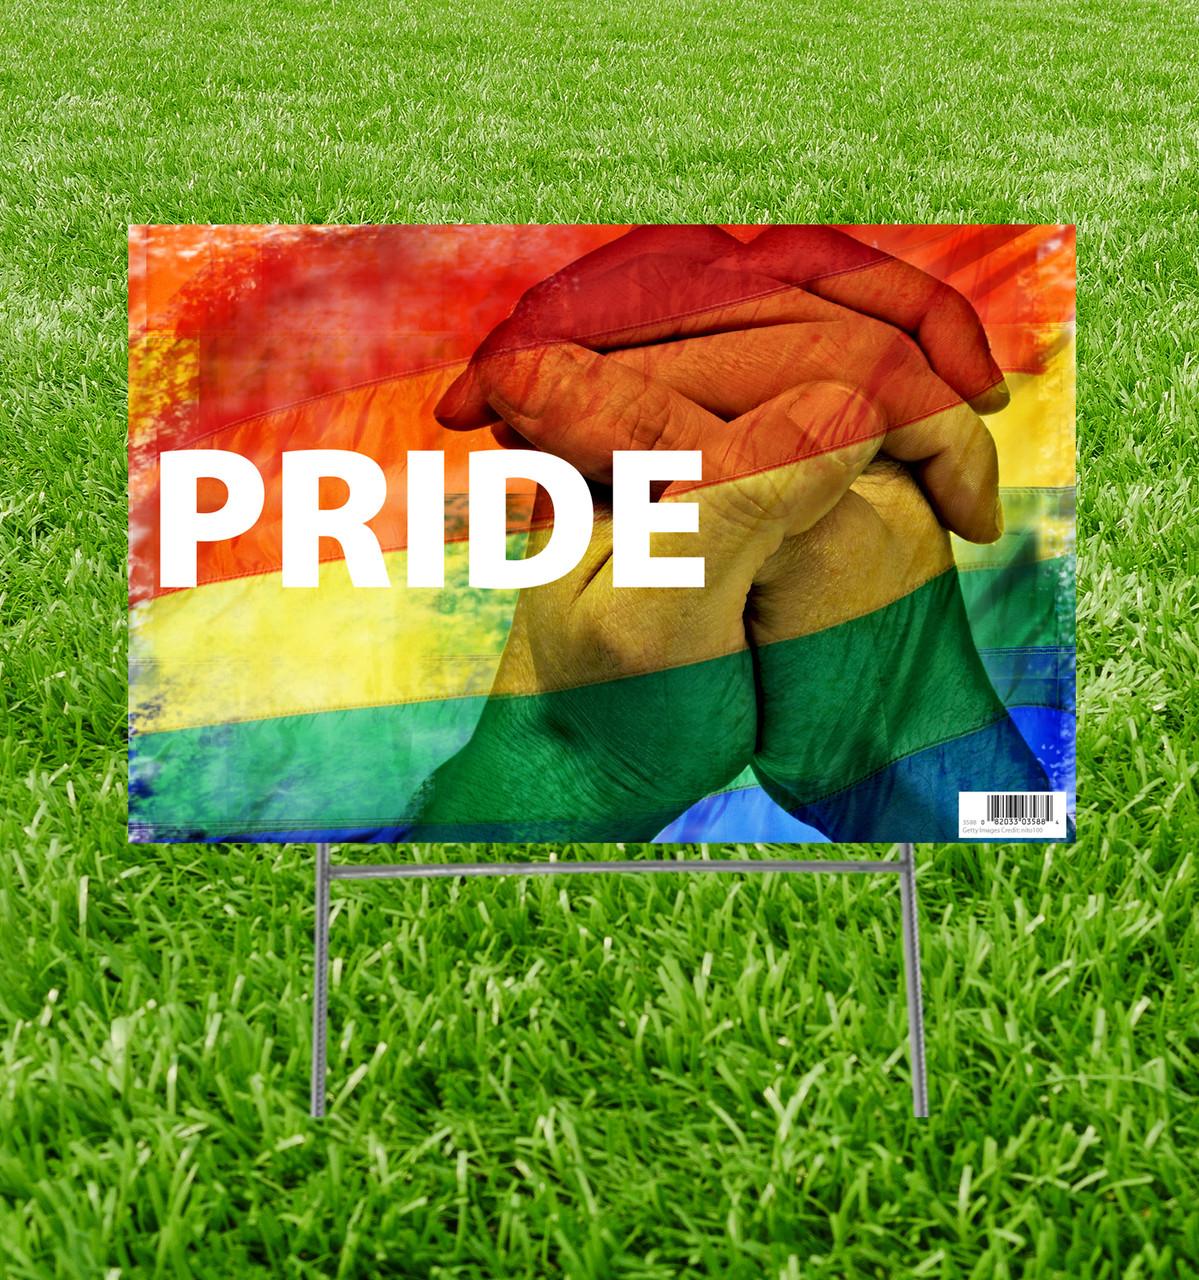 LGBT Pride Yard Sign.